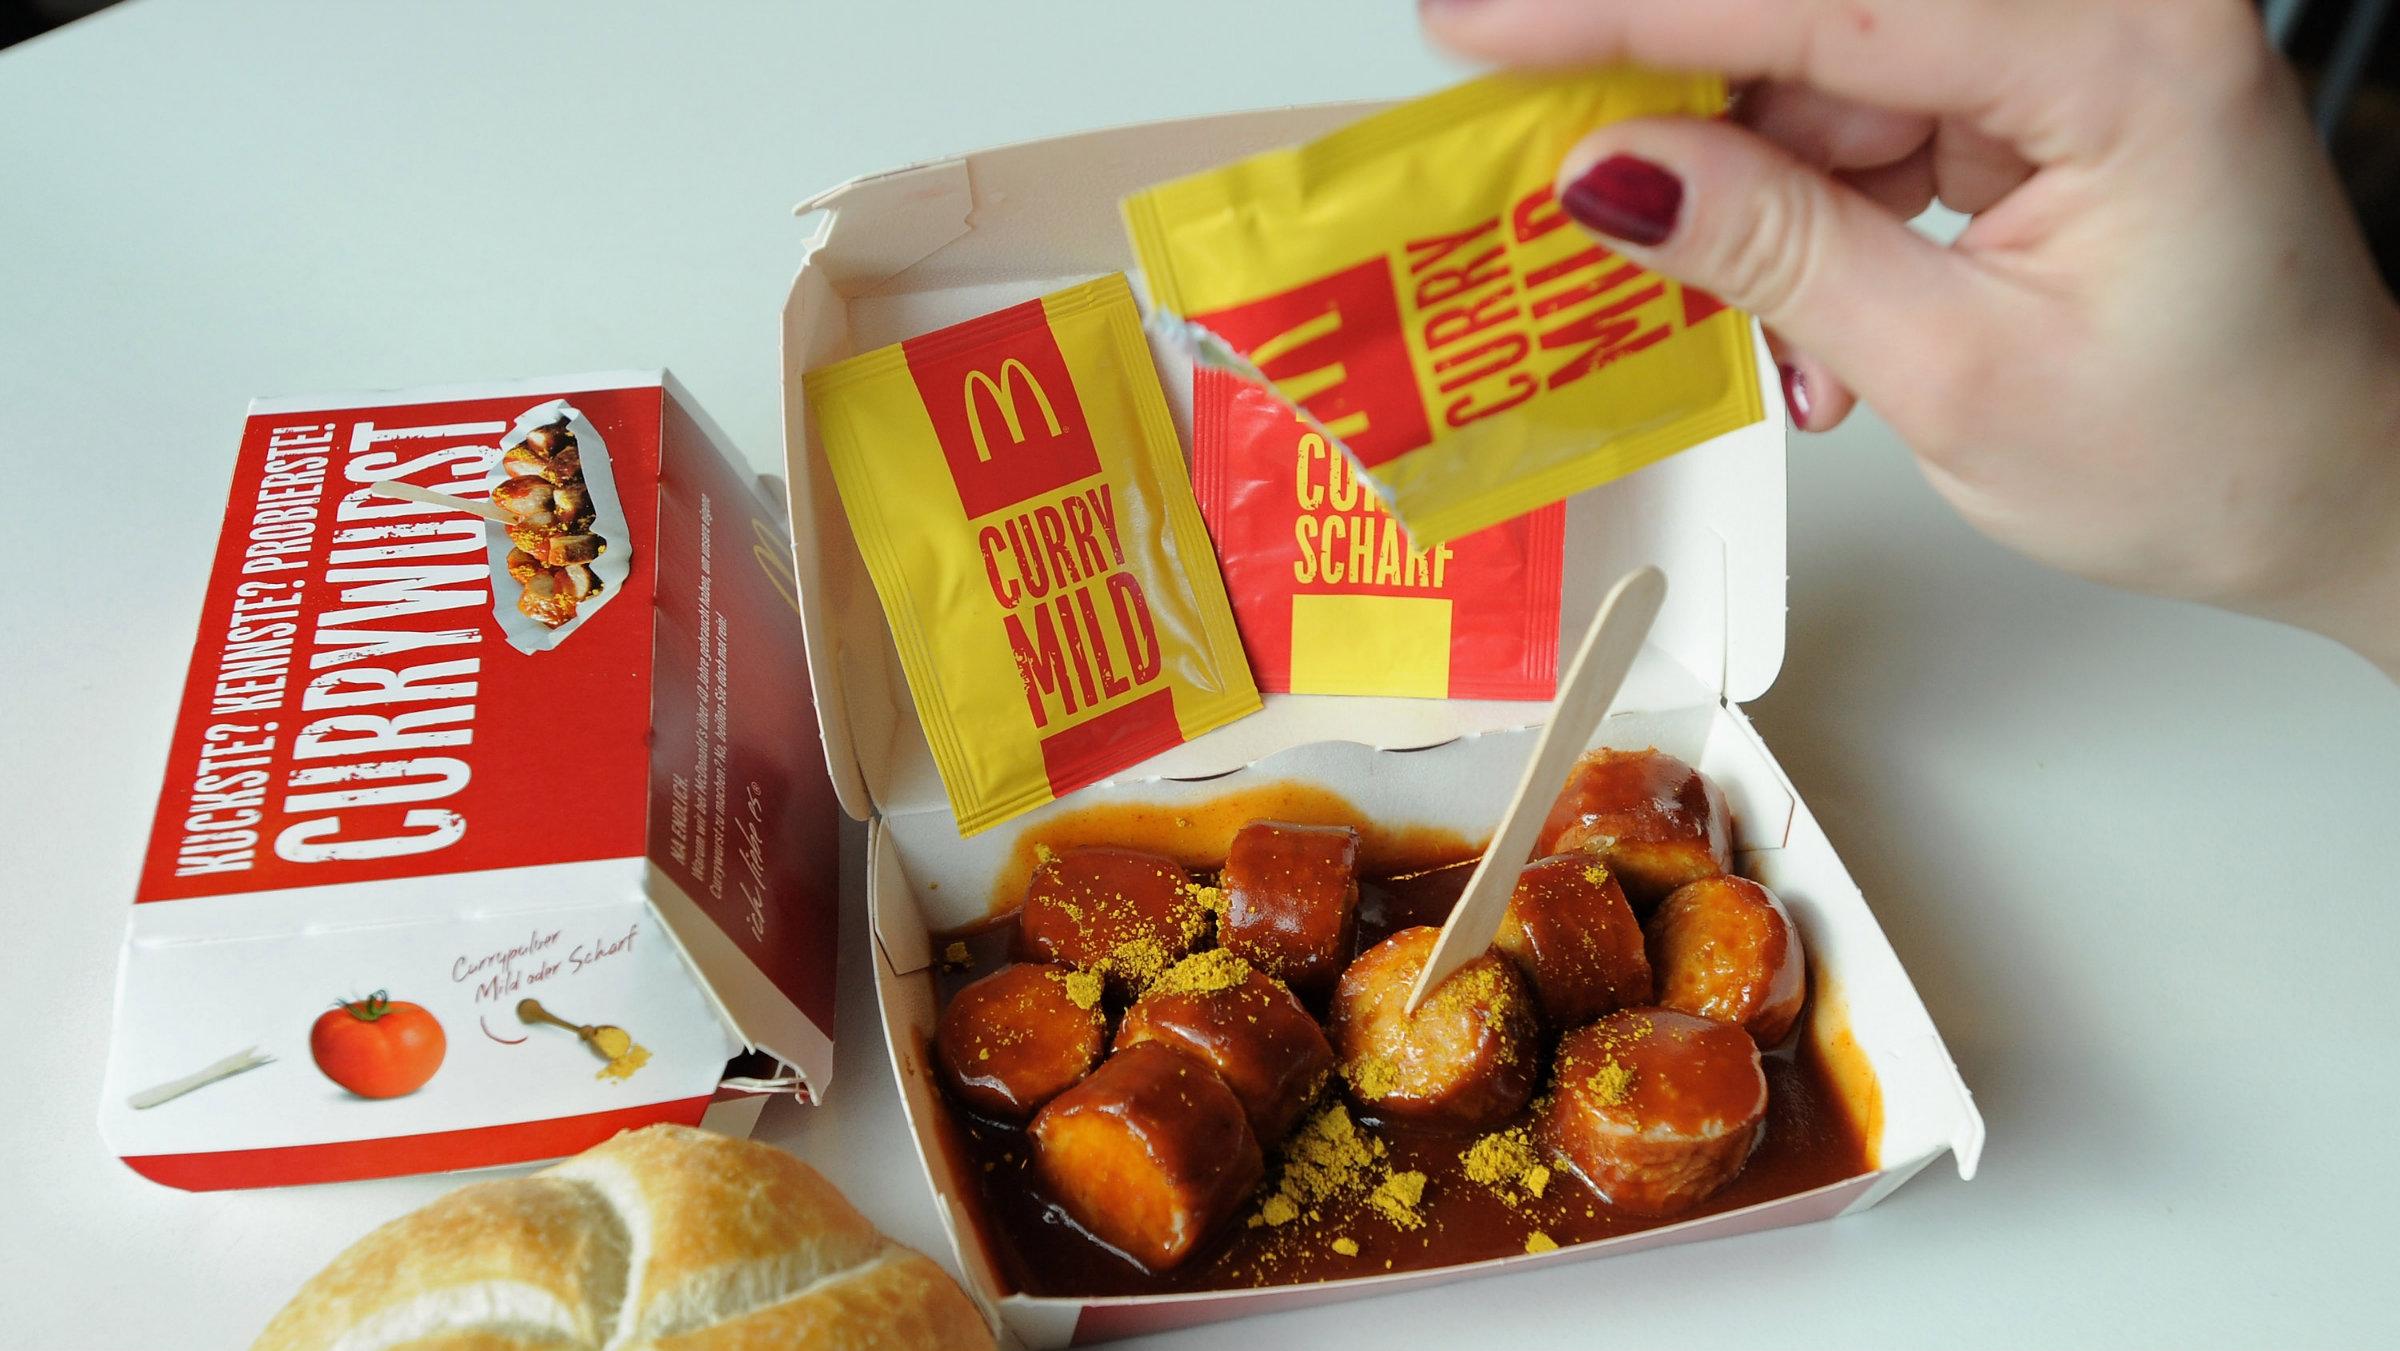 mcdonald's currywurst